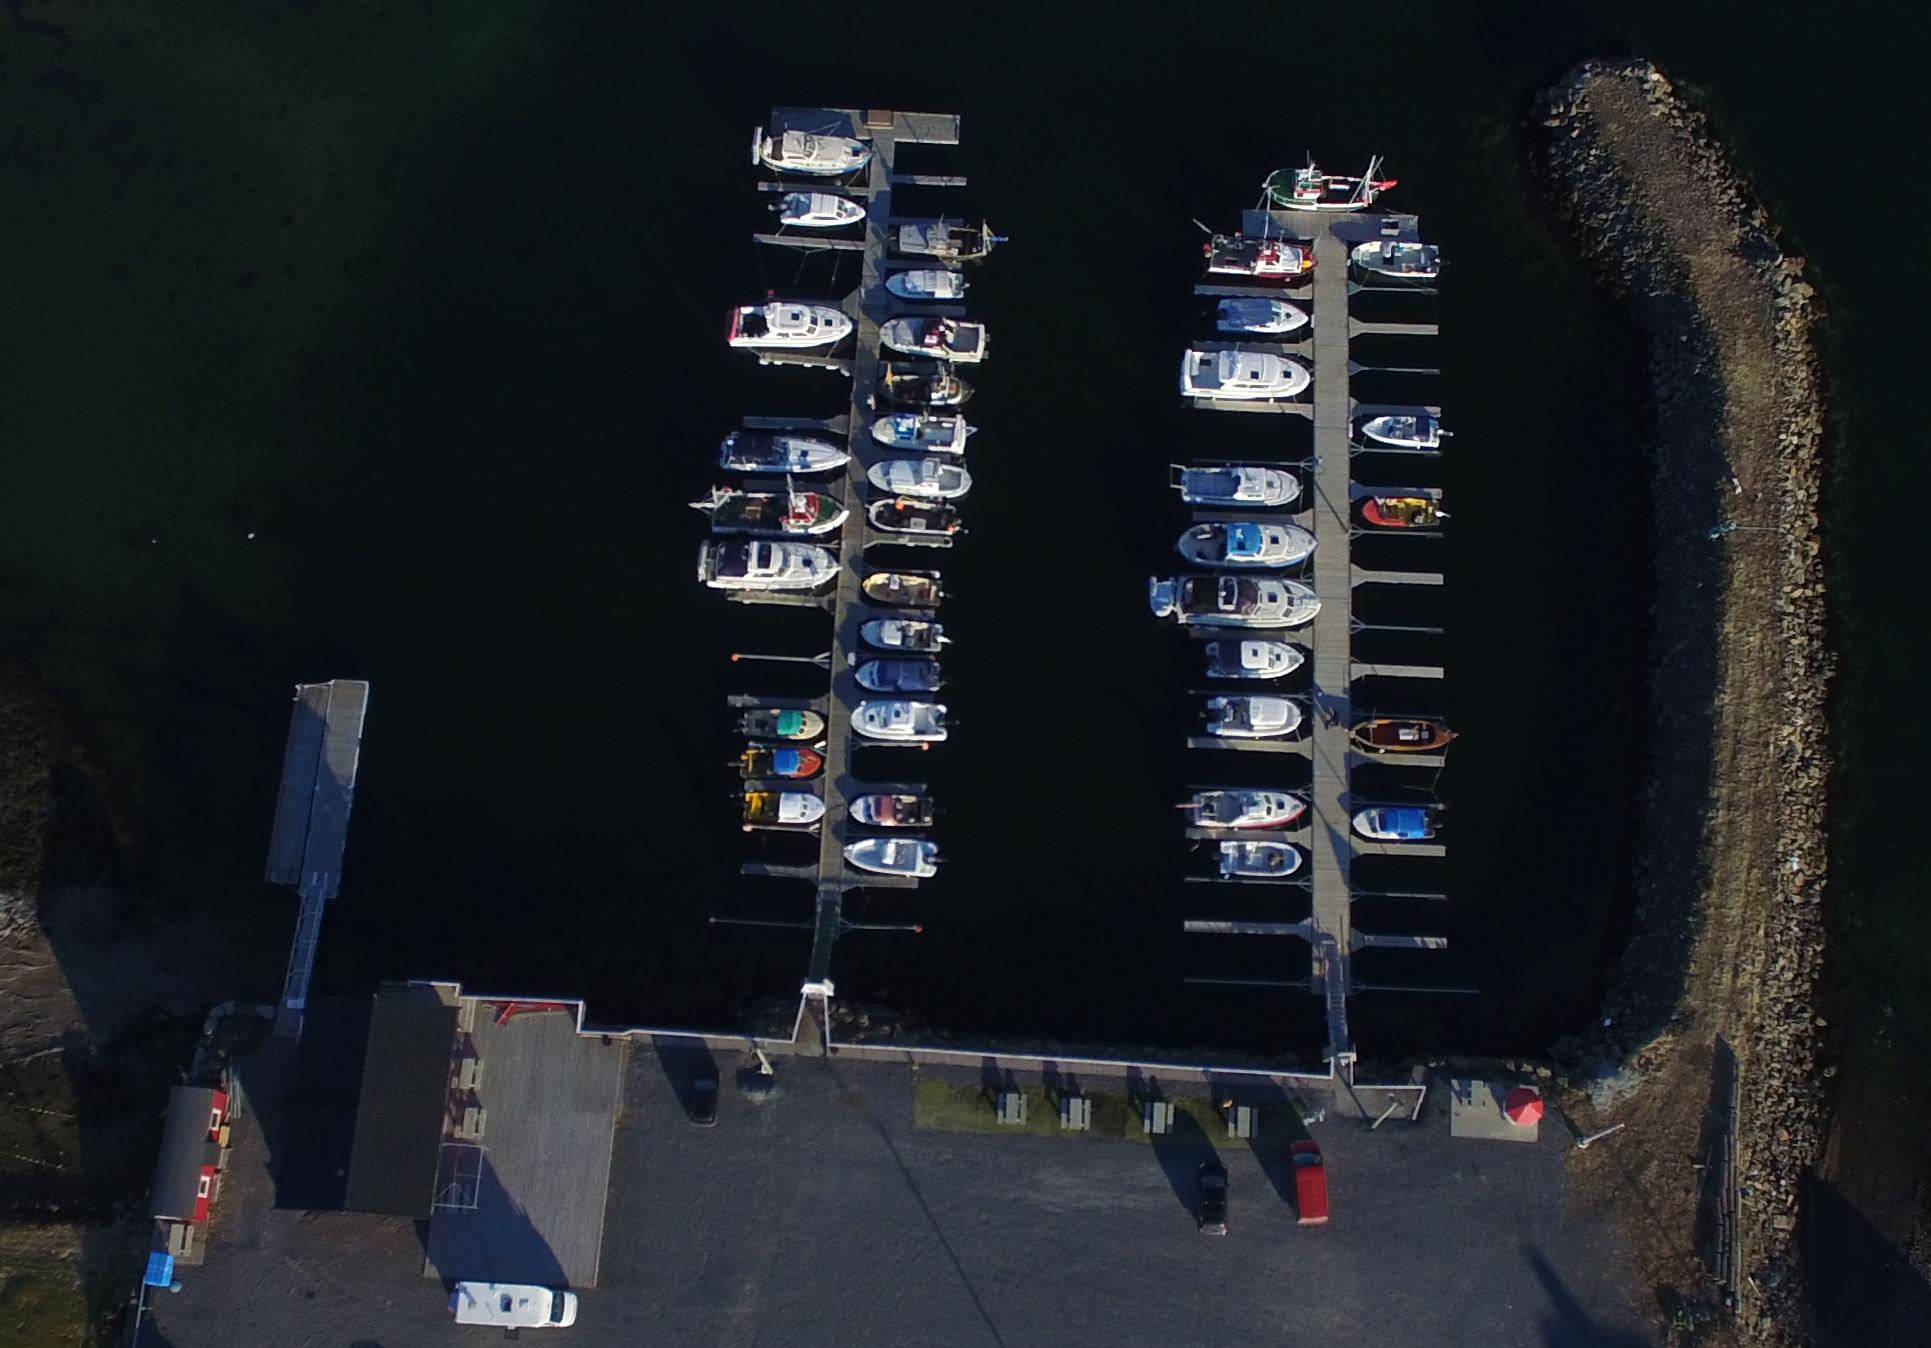 Flyfoto av båtbrygge